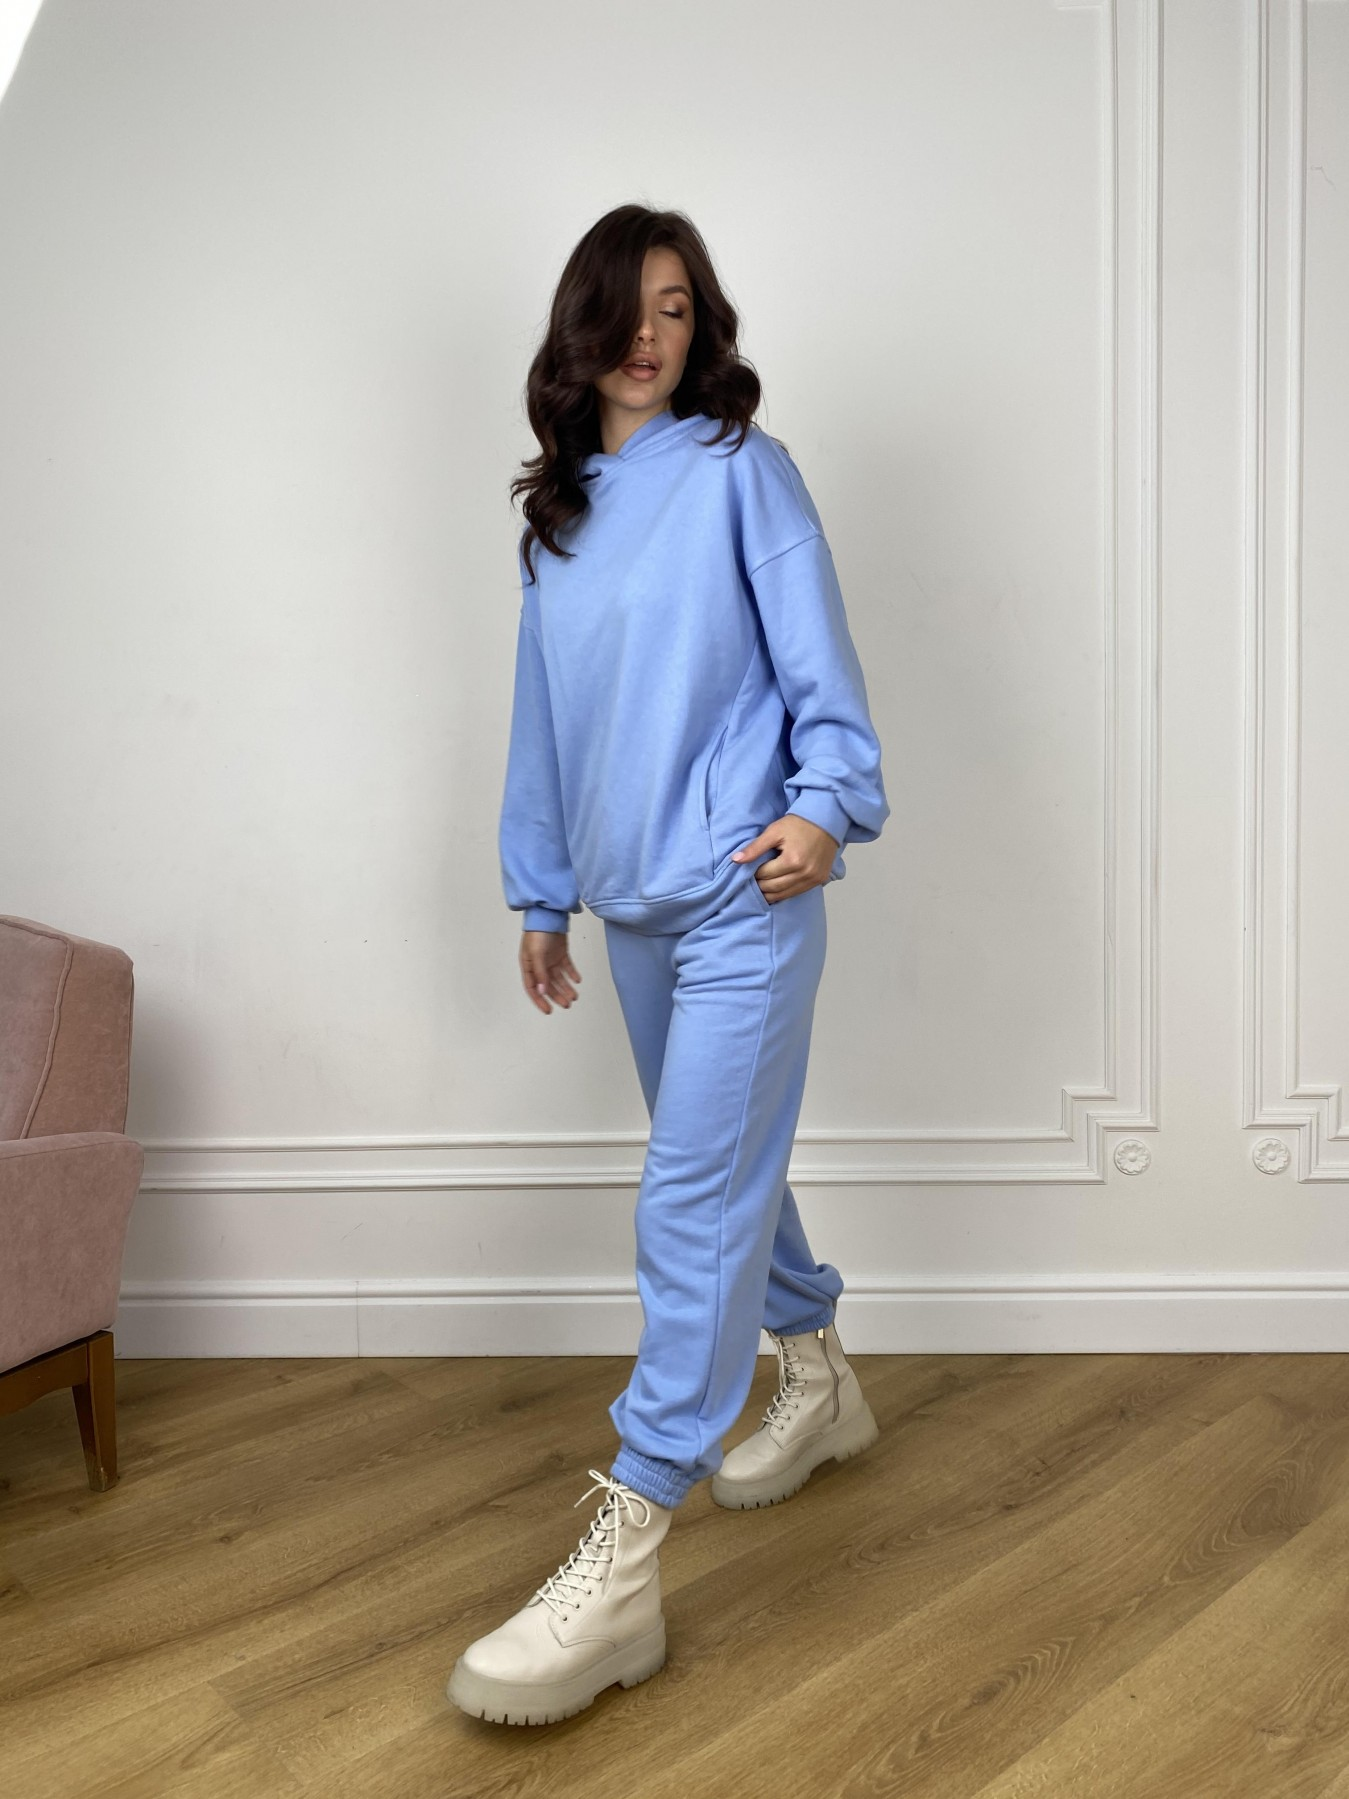 Марион костюм из 3х нитки 10581 АРТ. 46937 Цвет: Голубой - фото 3, интернет магазин tm-modus.ru